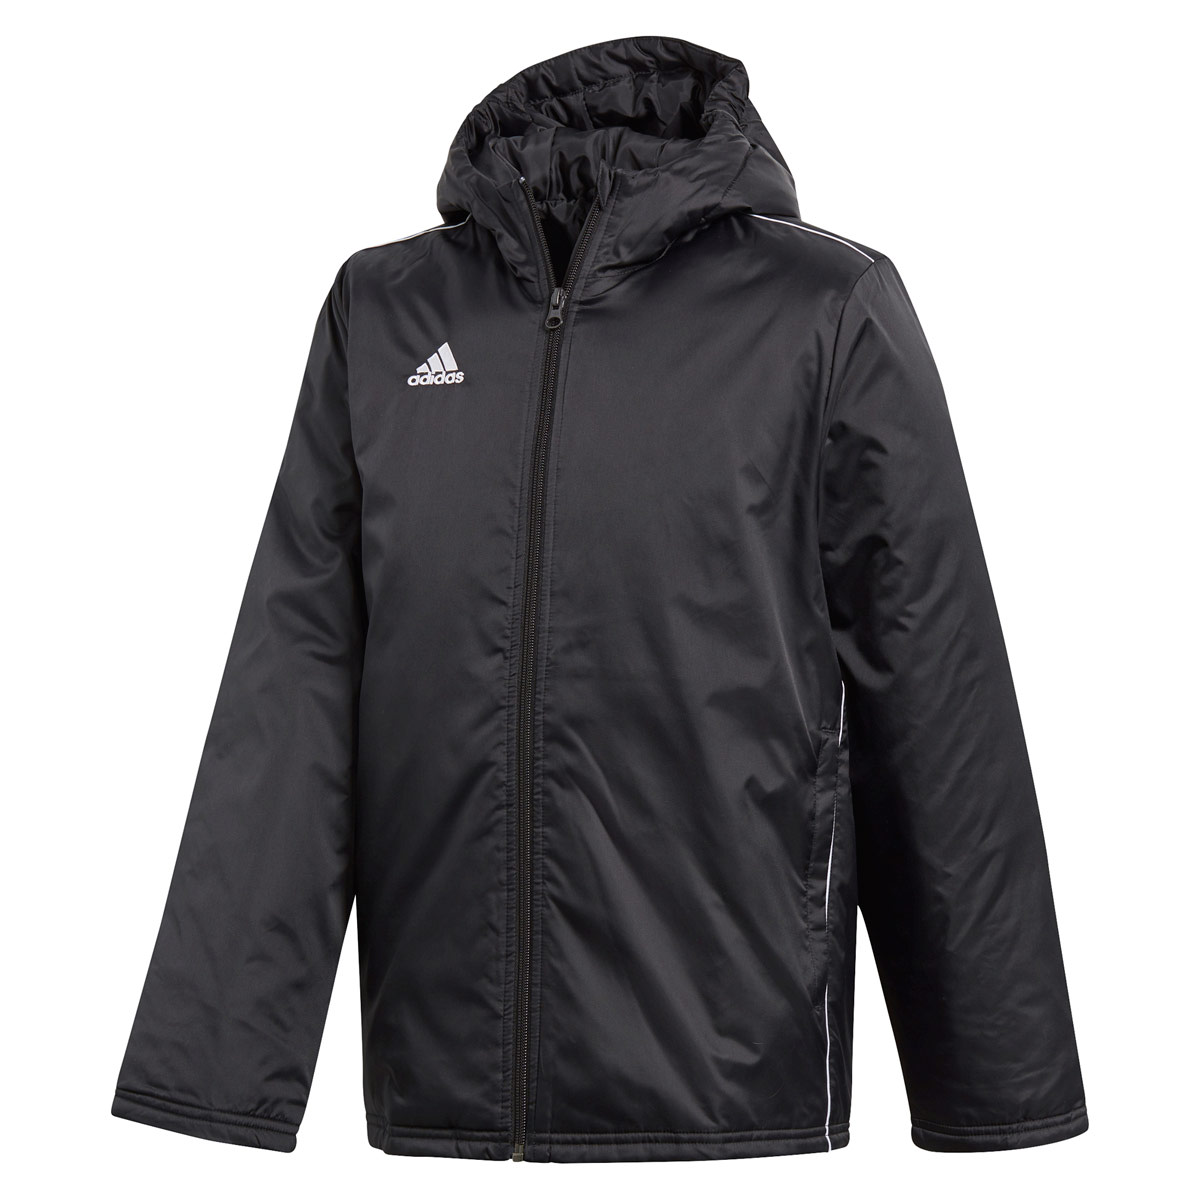 adidas Core 18 Stadium Jacke - Laufjacken - Schwarz